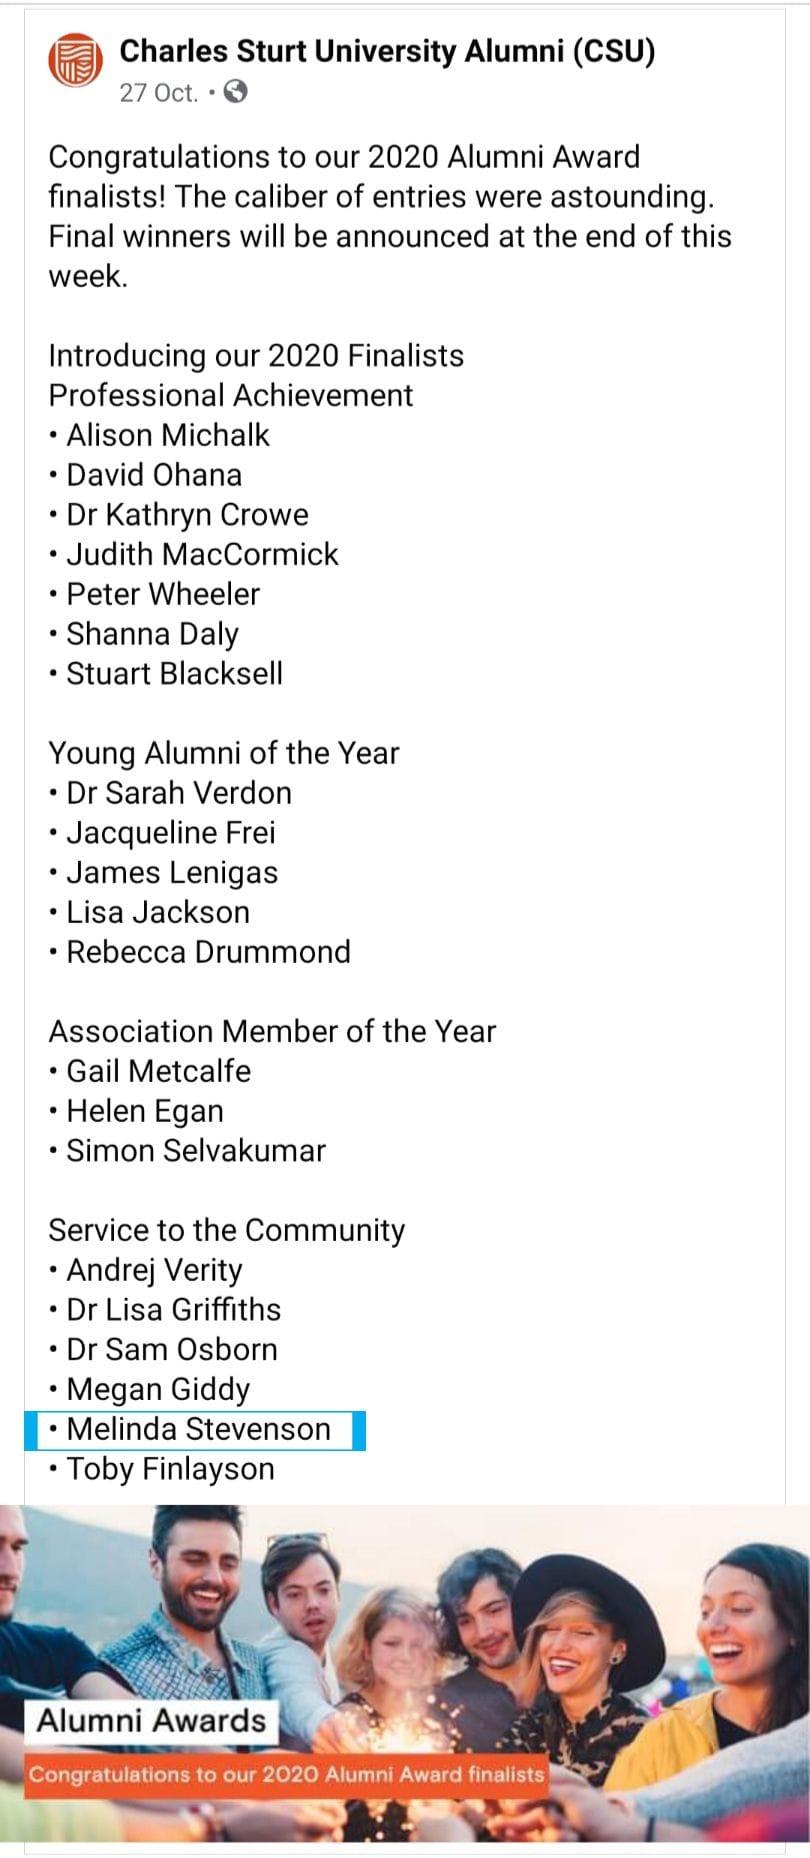 Charles Sturt University Facebook 2020 Alumni Awards Finalists Announcement